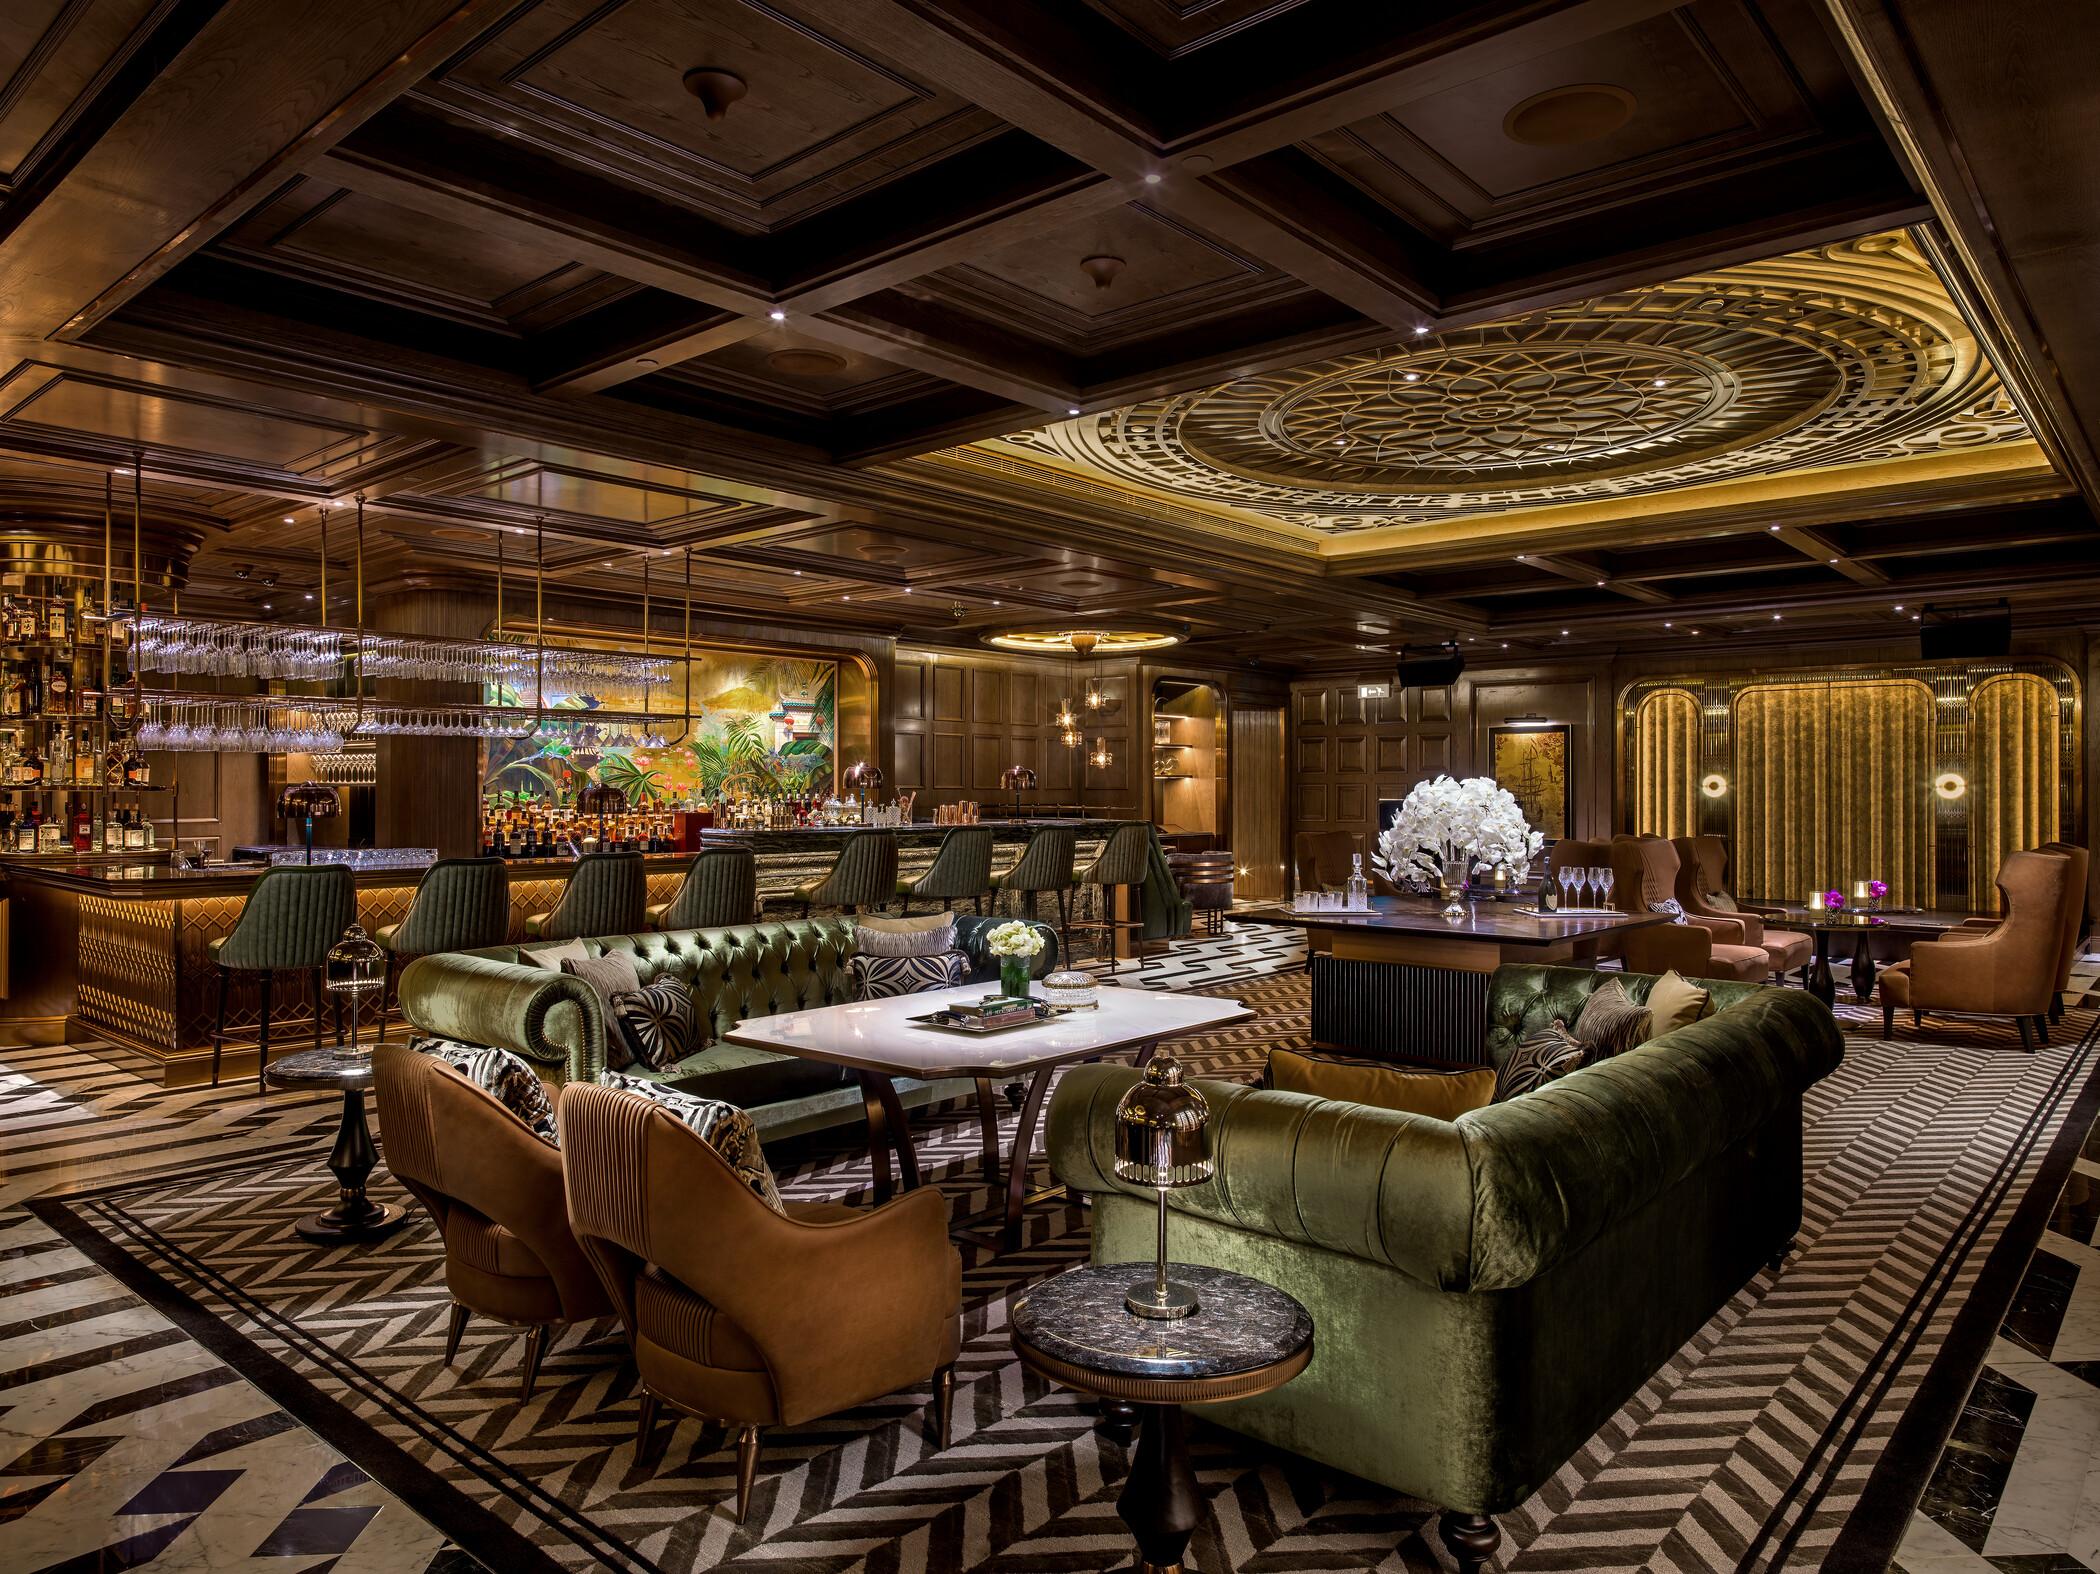 The St. Regis Bar Room